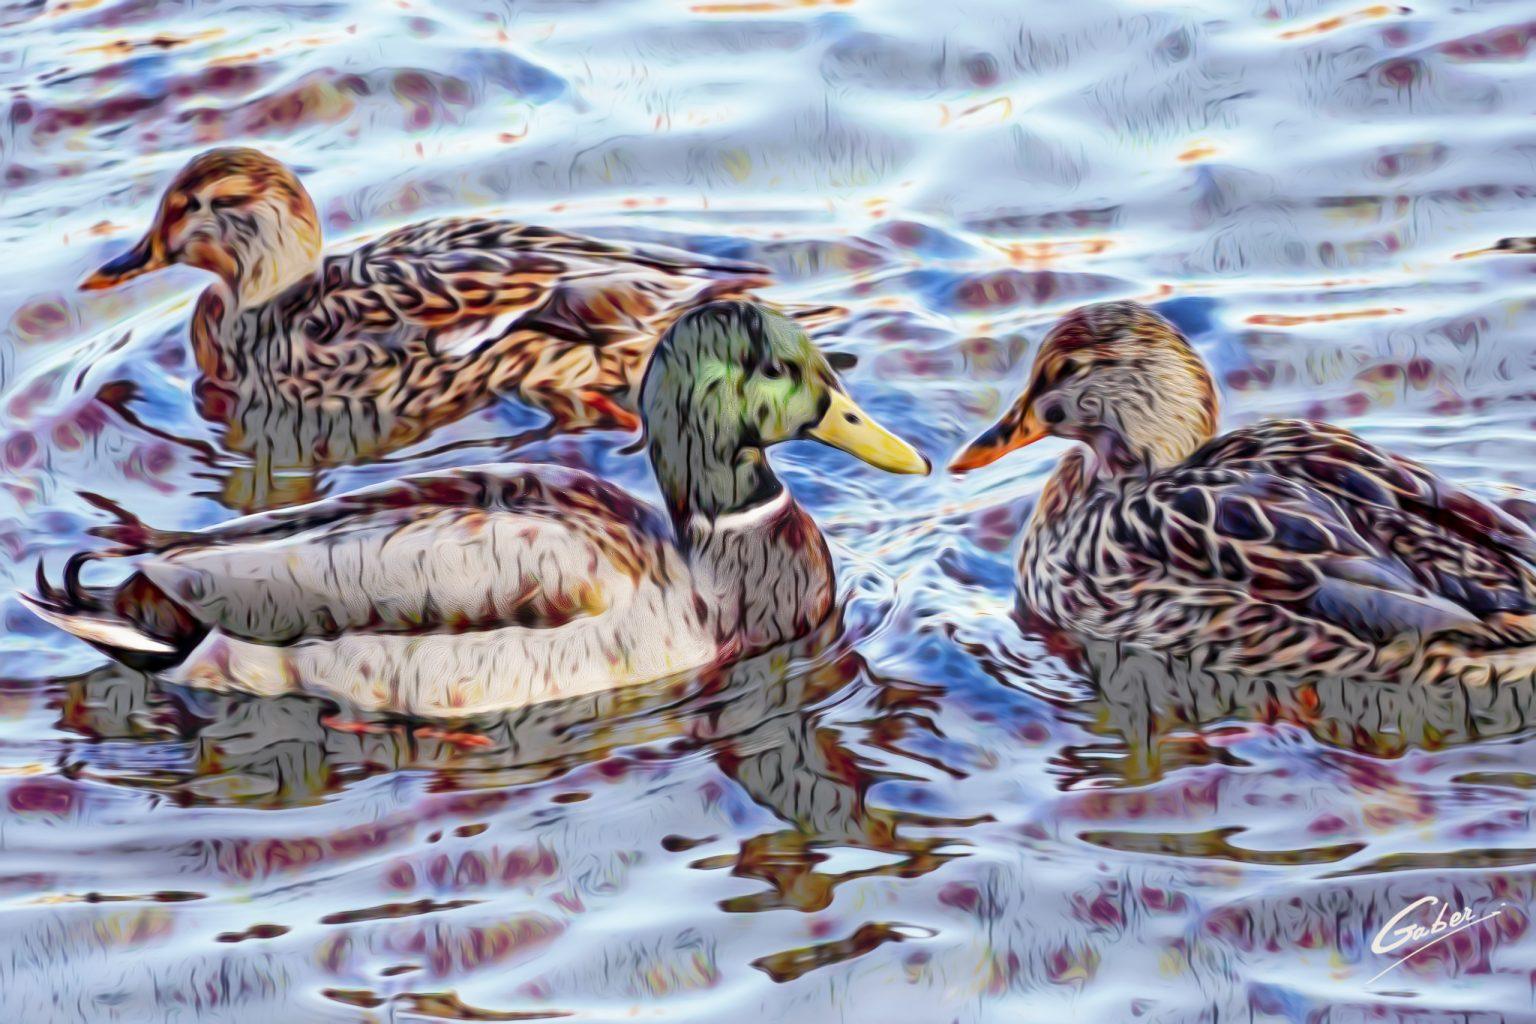 Ducks_2020_11_16x24_FINAL_GAB-FLW21-BESAS-50